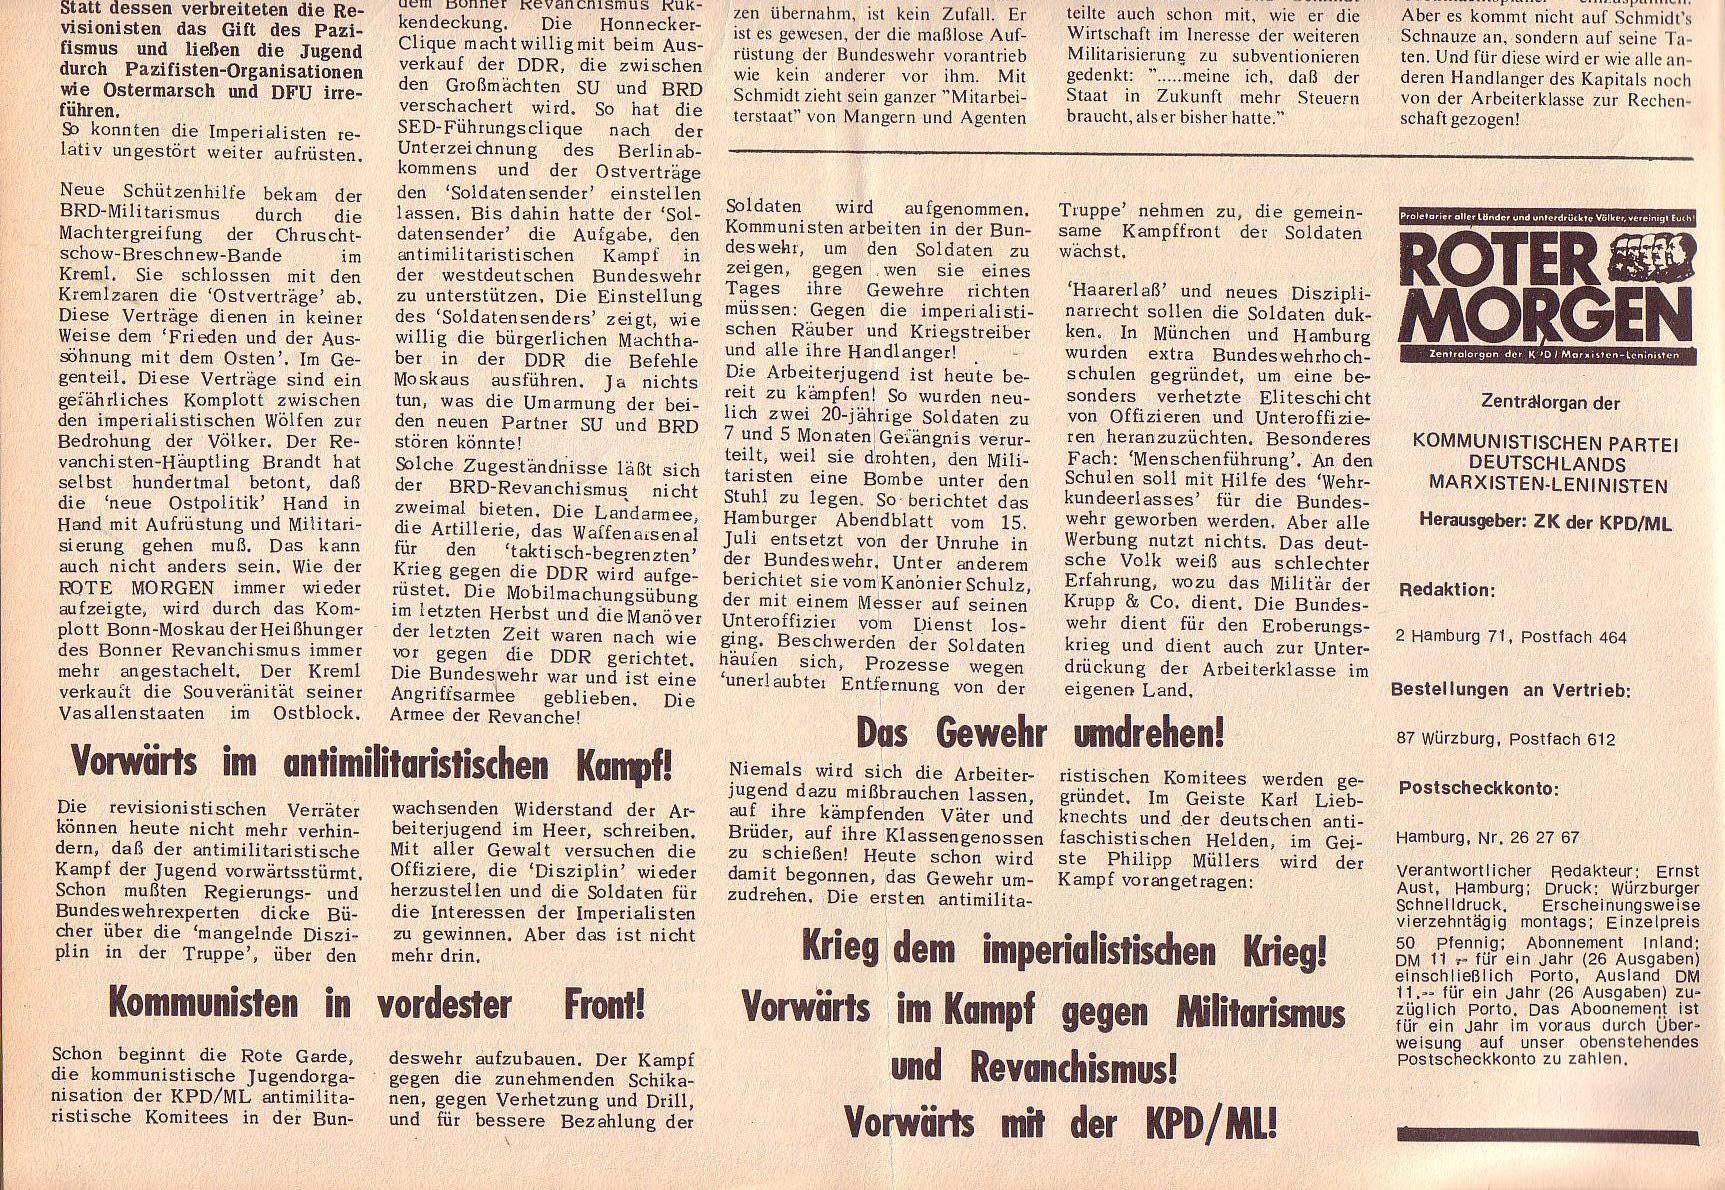 Roter Morgen, 6. Jg., 31. Juli 1972, Nr. 15, Seite 2b